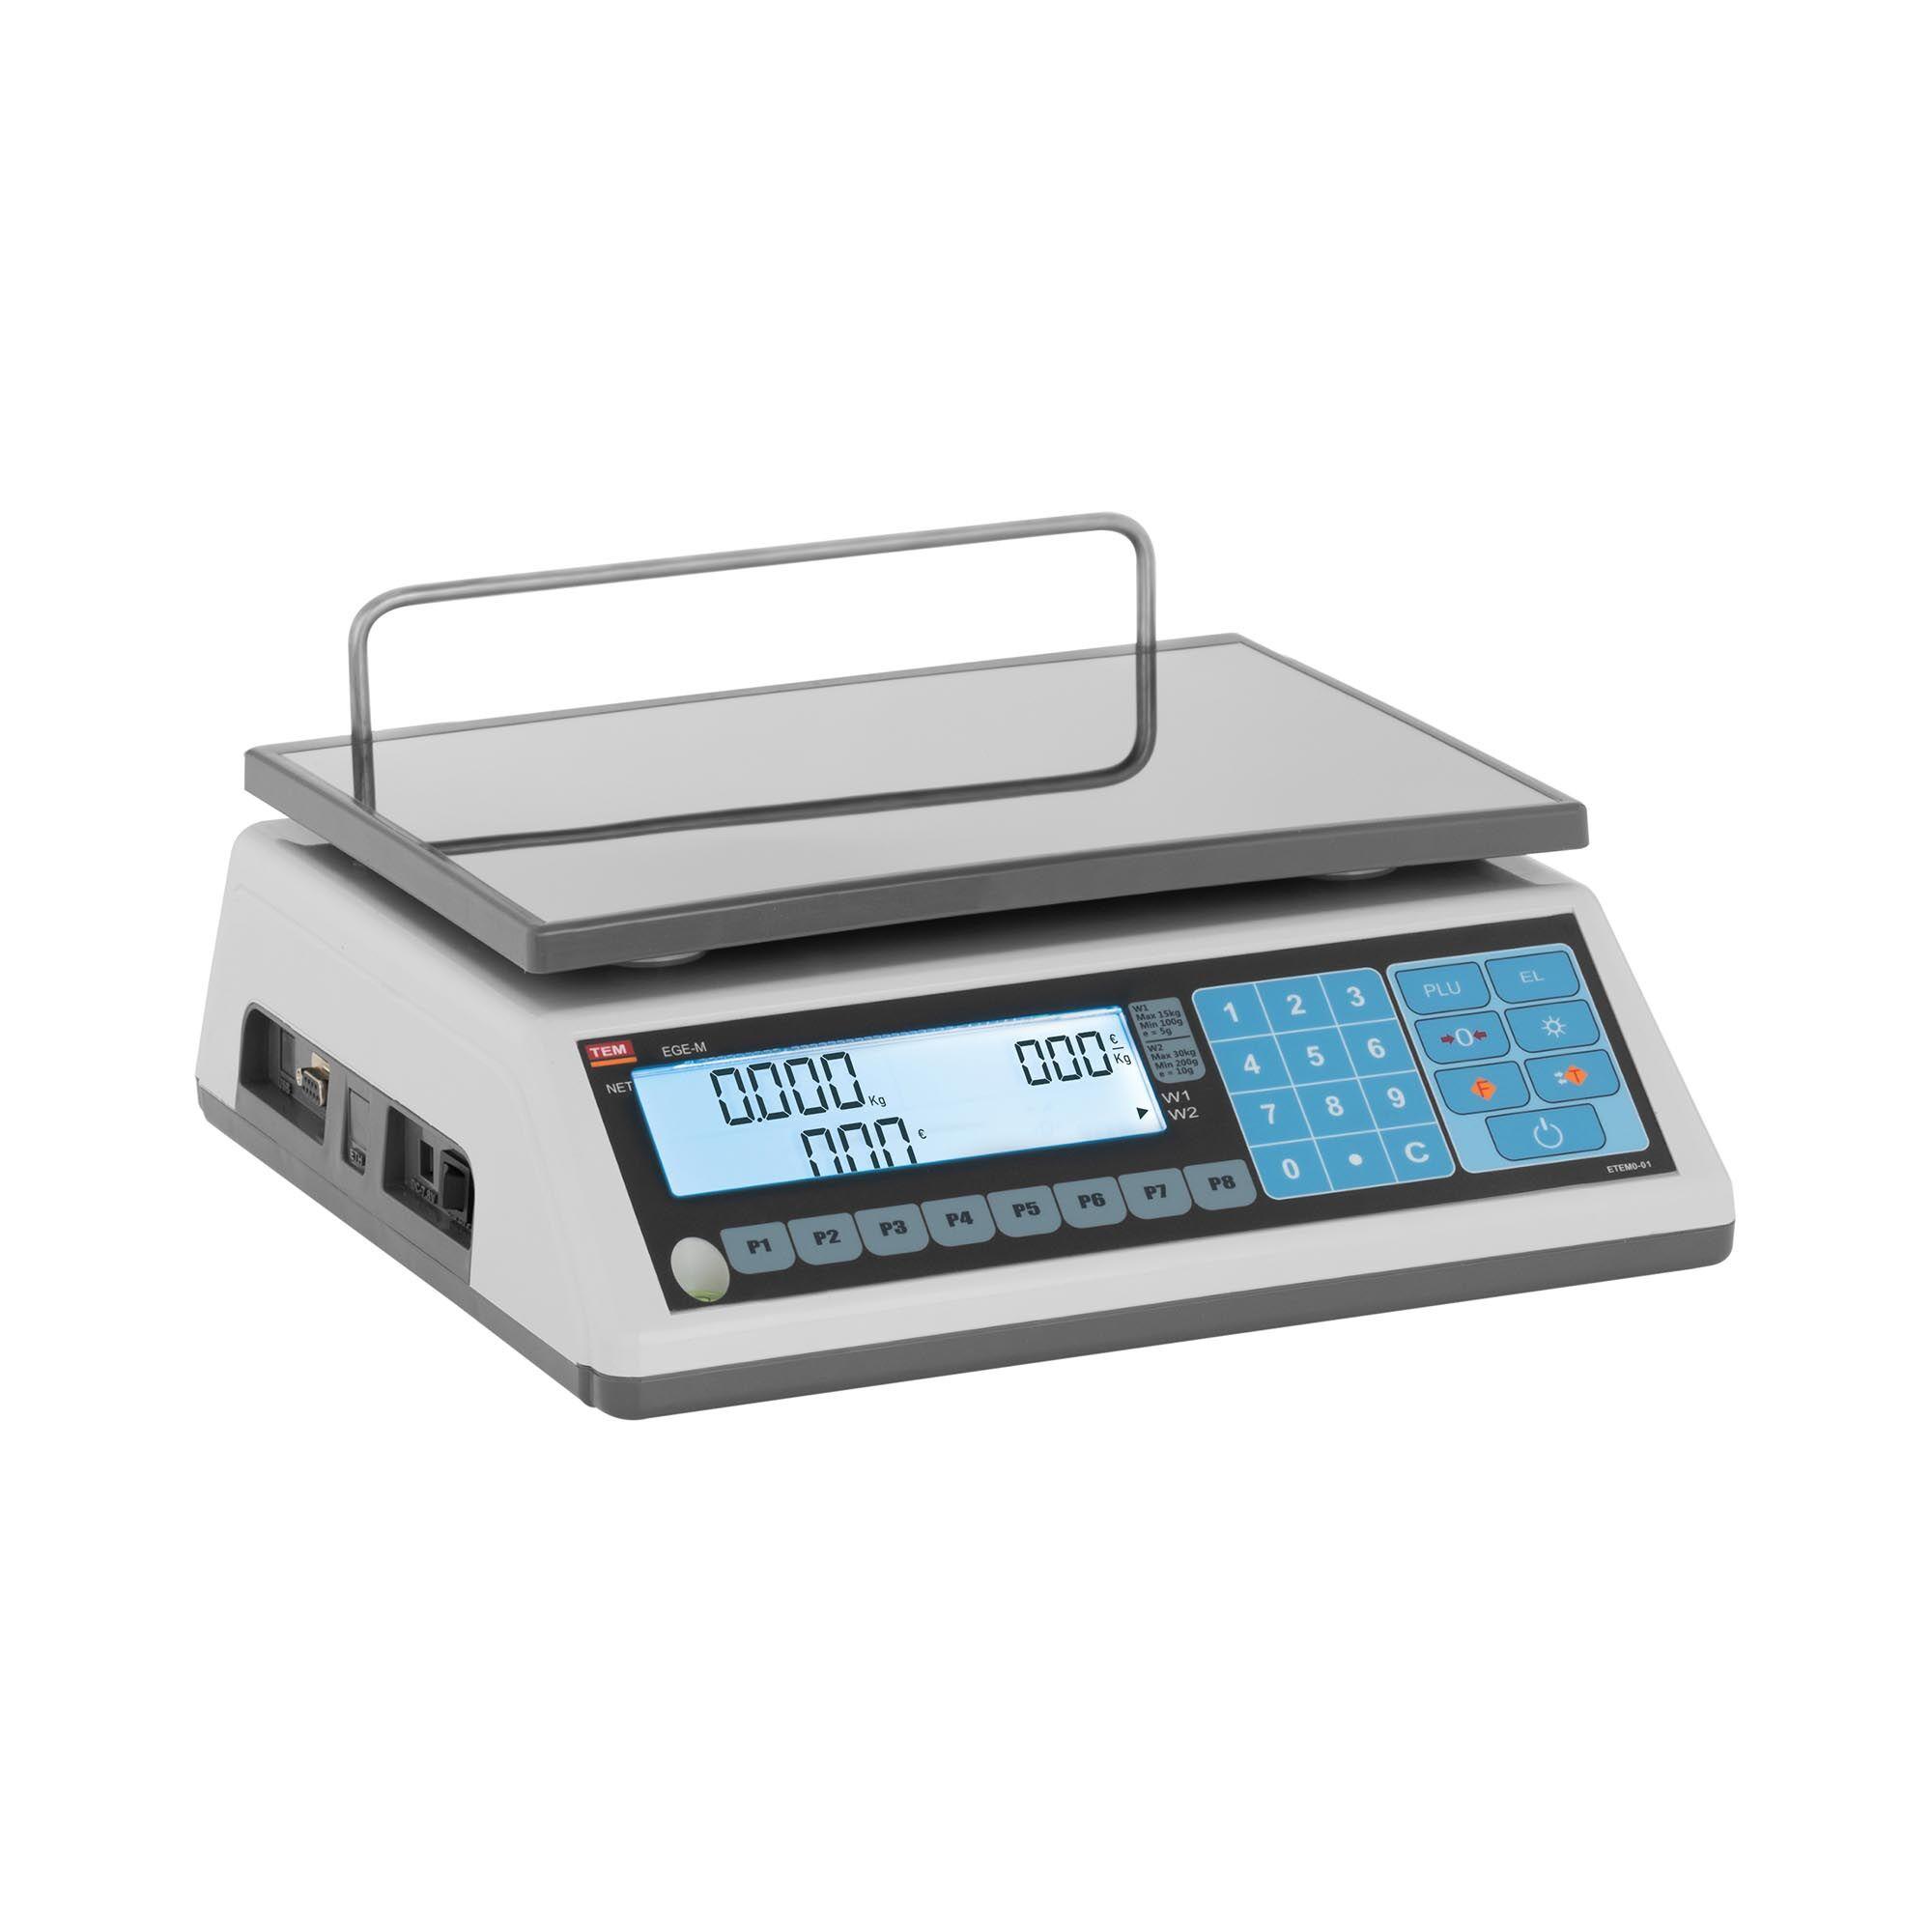 TEM Balance poids-prix - Calibrage certifié - 15 kg/5 g - 30 kg/10 g TEM030D-B1